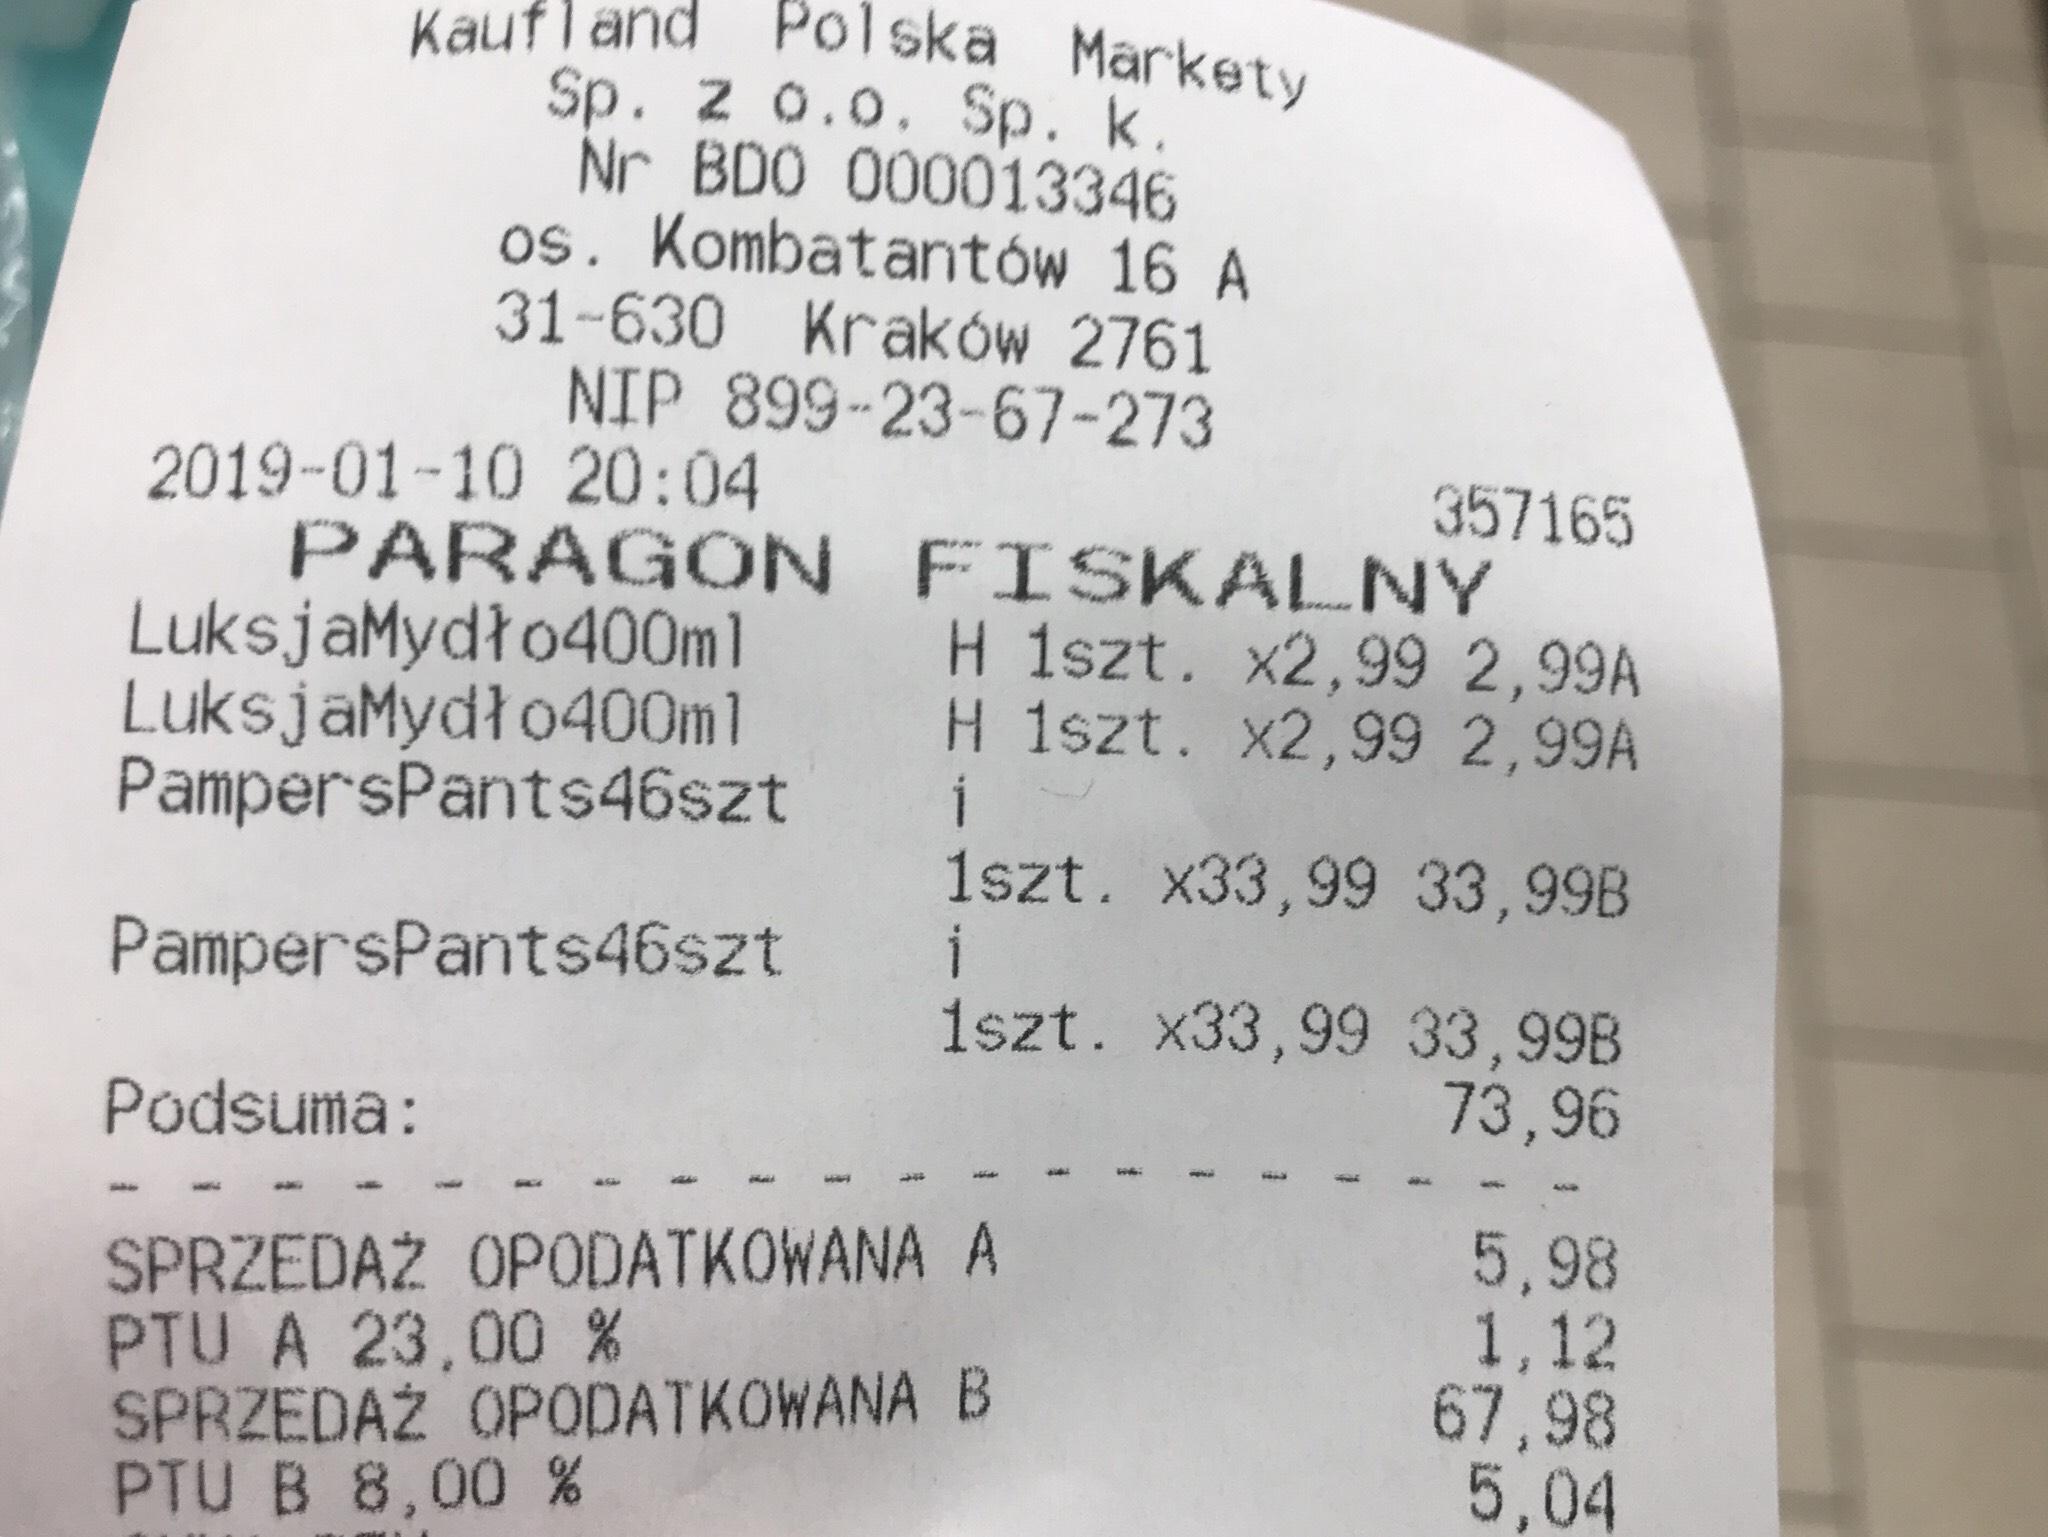 Pieluchy Pampers Pants 33,99 0,74zl/szt Kaufland